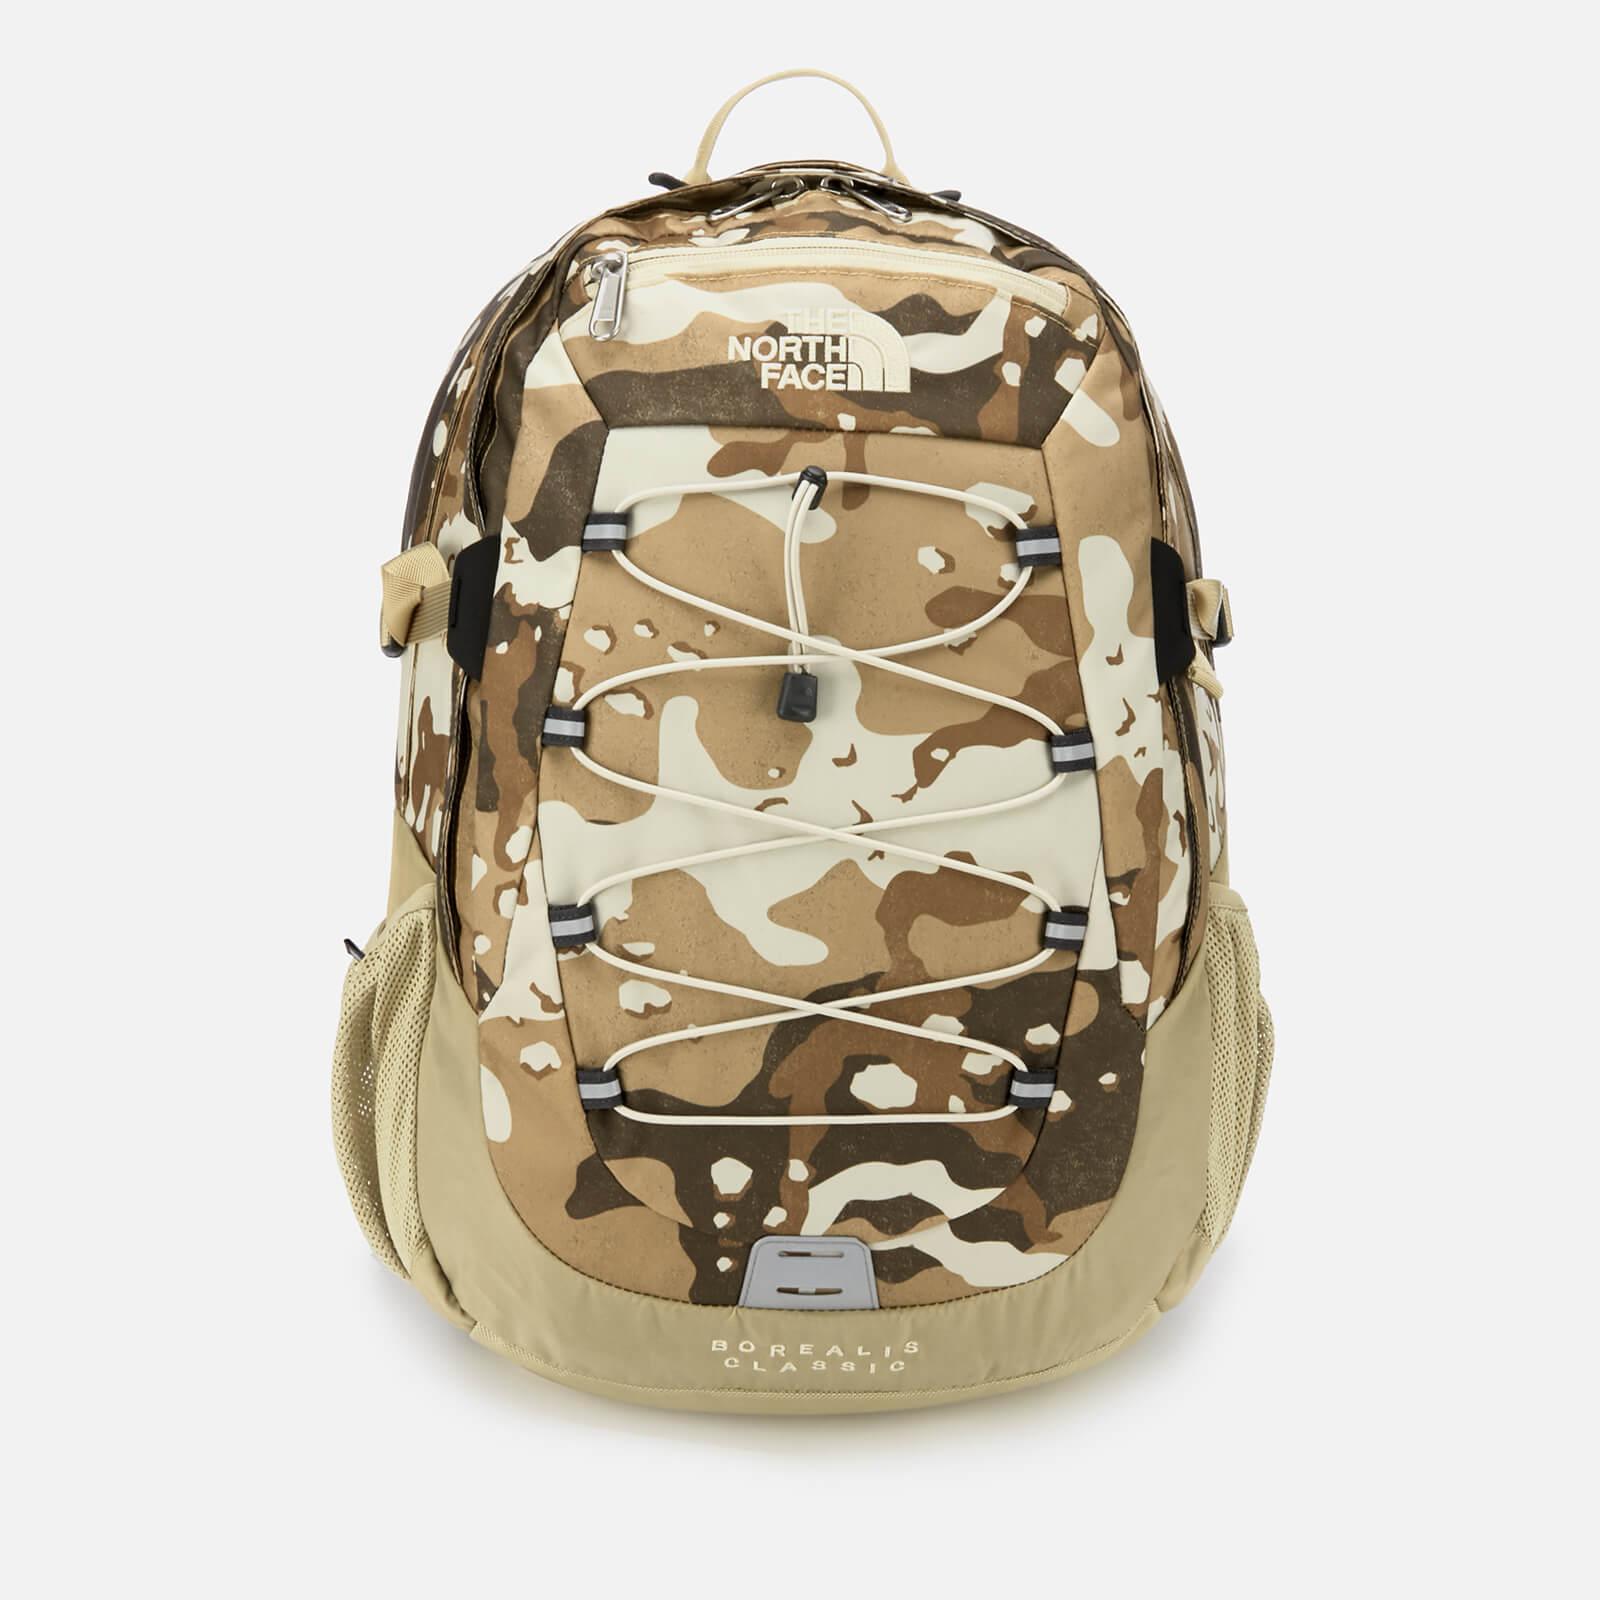 b4ae453a8 The North Face Borealis Classic Backpack - Moab Khaki Woodchip Camo Desert  Print